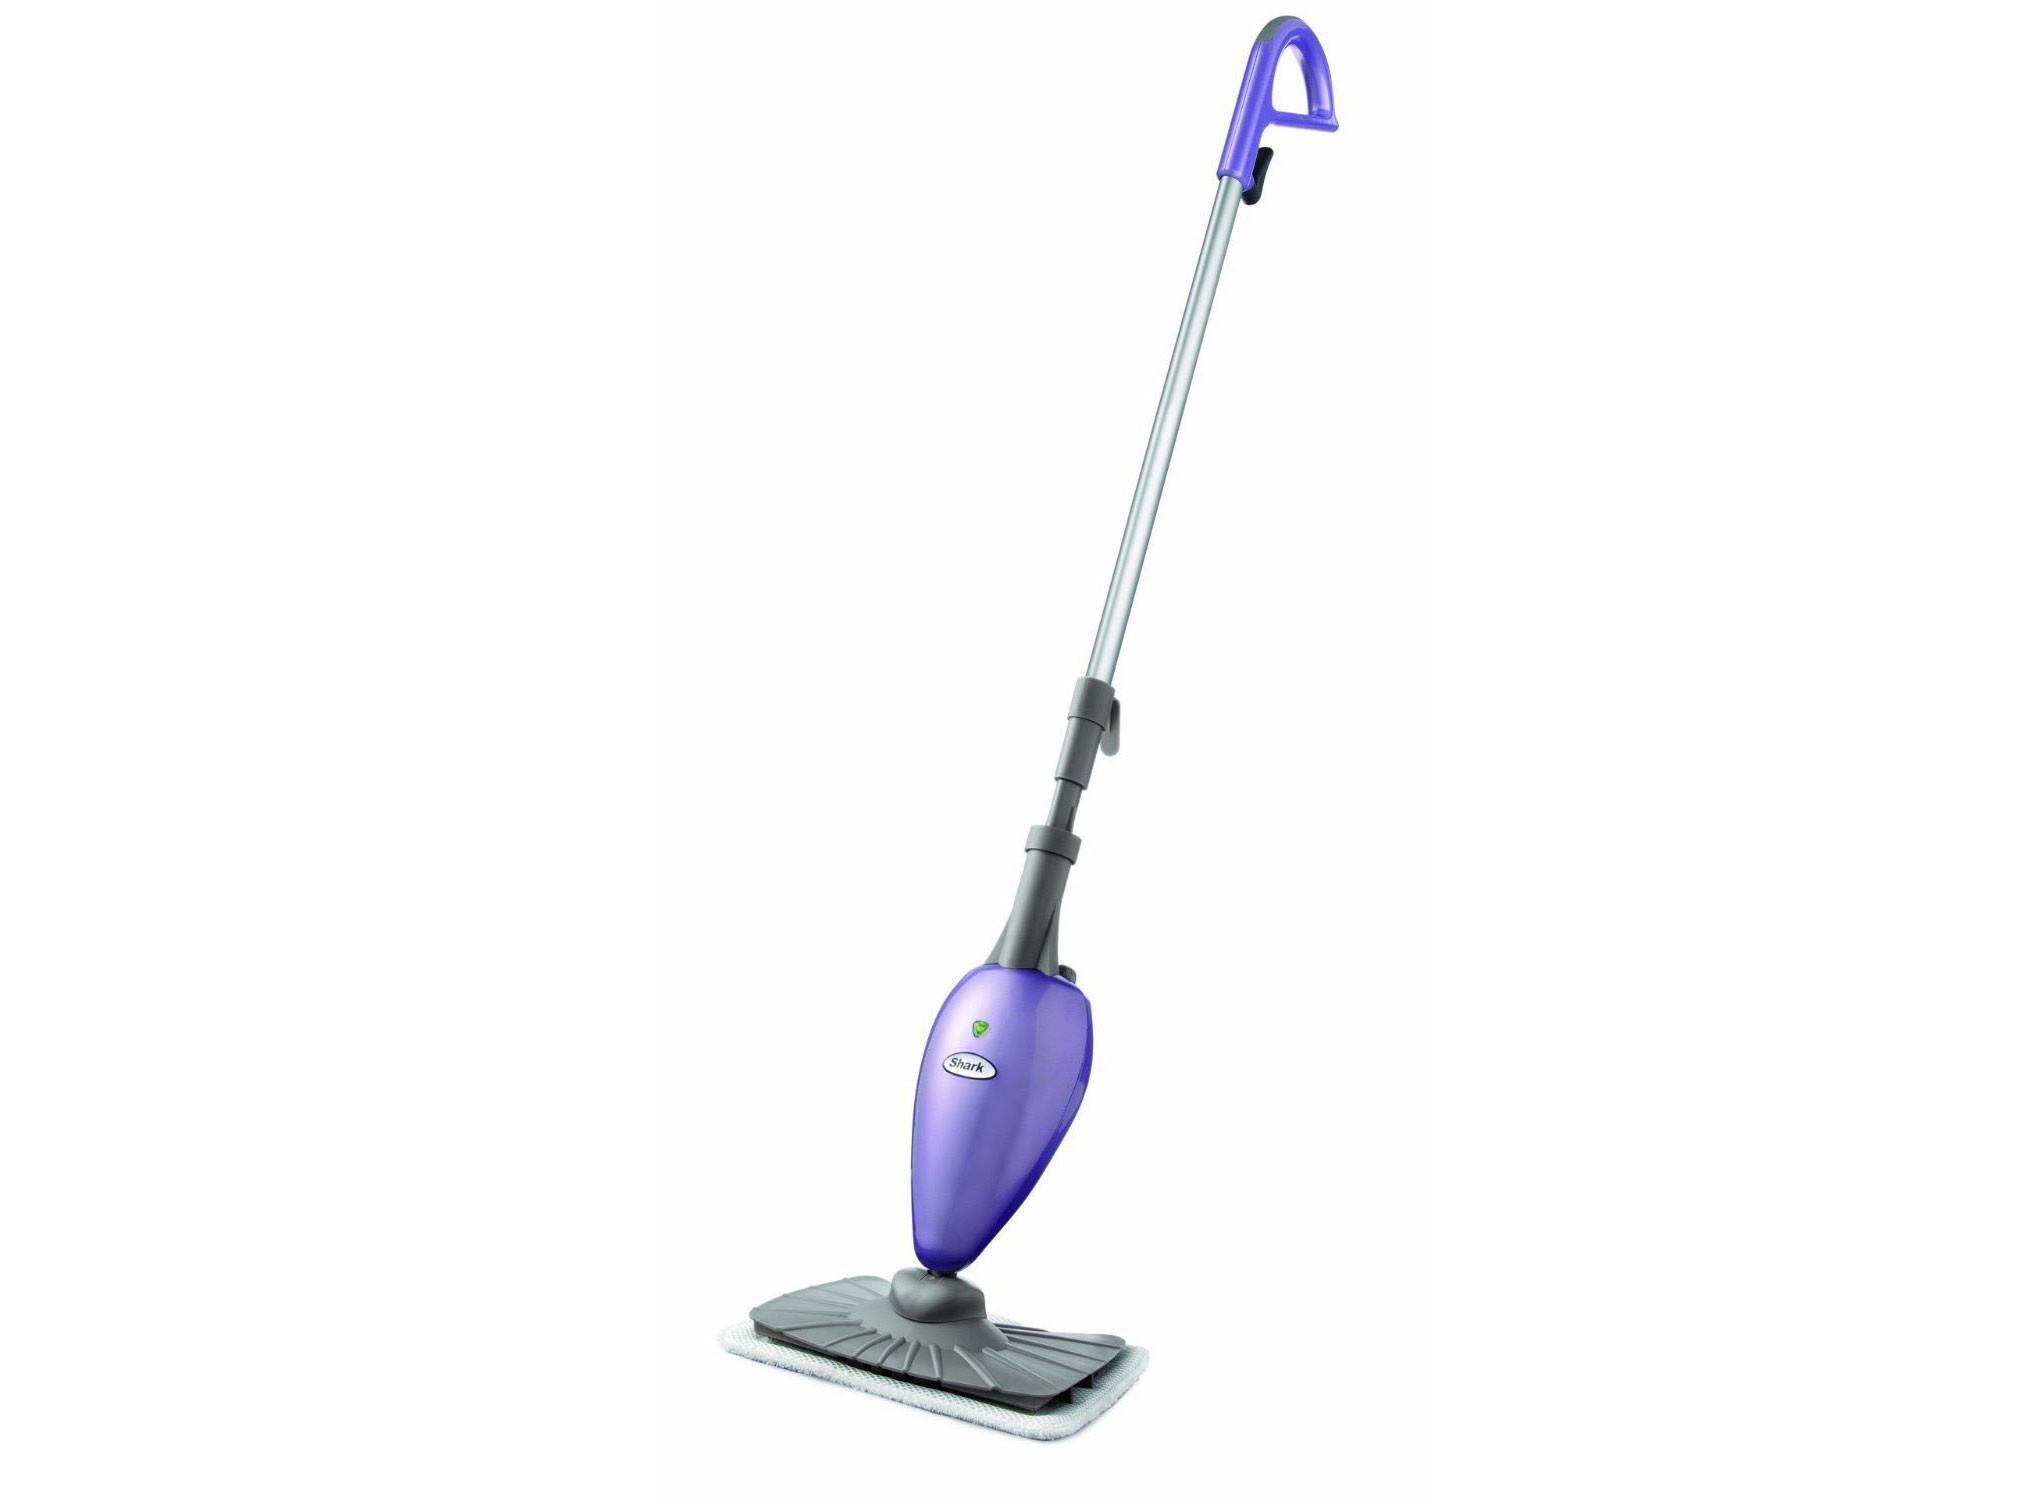 hardwood floor steam cleaner amazon of the 4 best steam mops in 545e3670 5b7a 407a 917d 562e89f68073 2f00d574 547b 4c8c ae67 64fa9ad8e040 shark